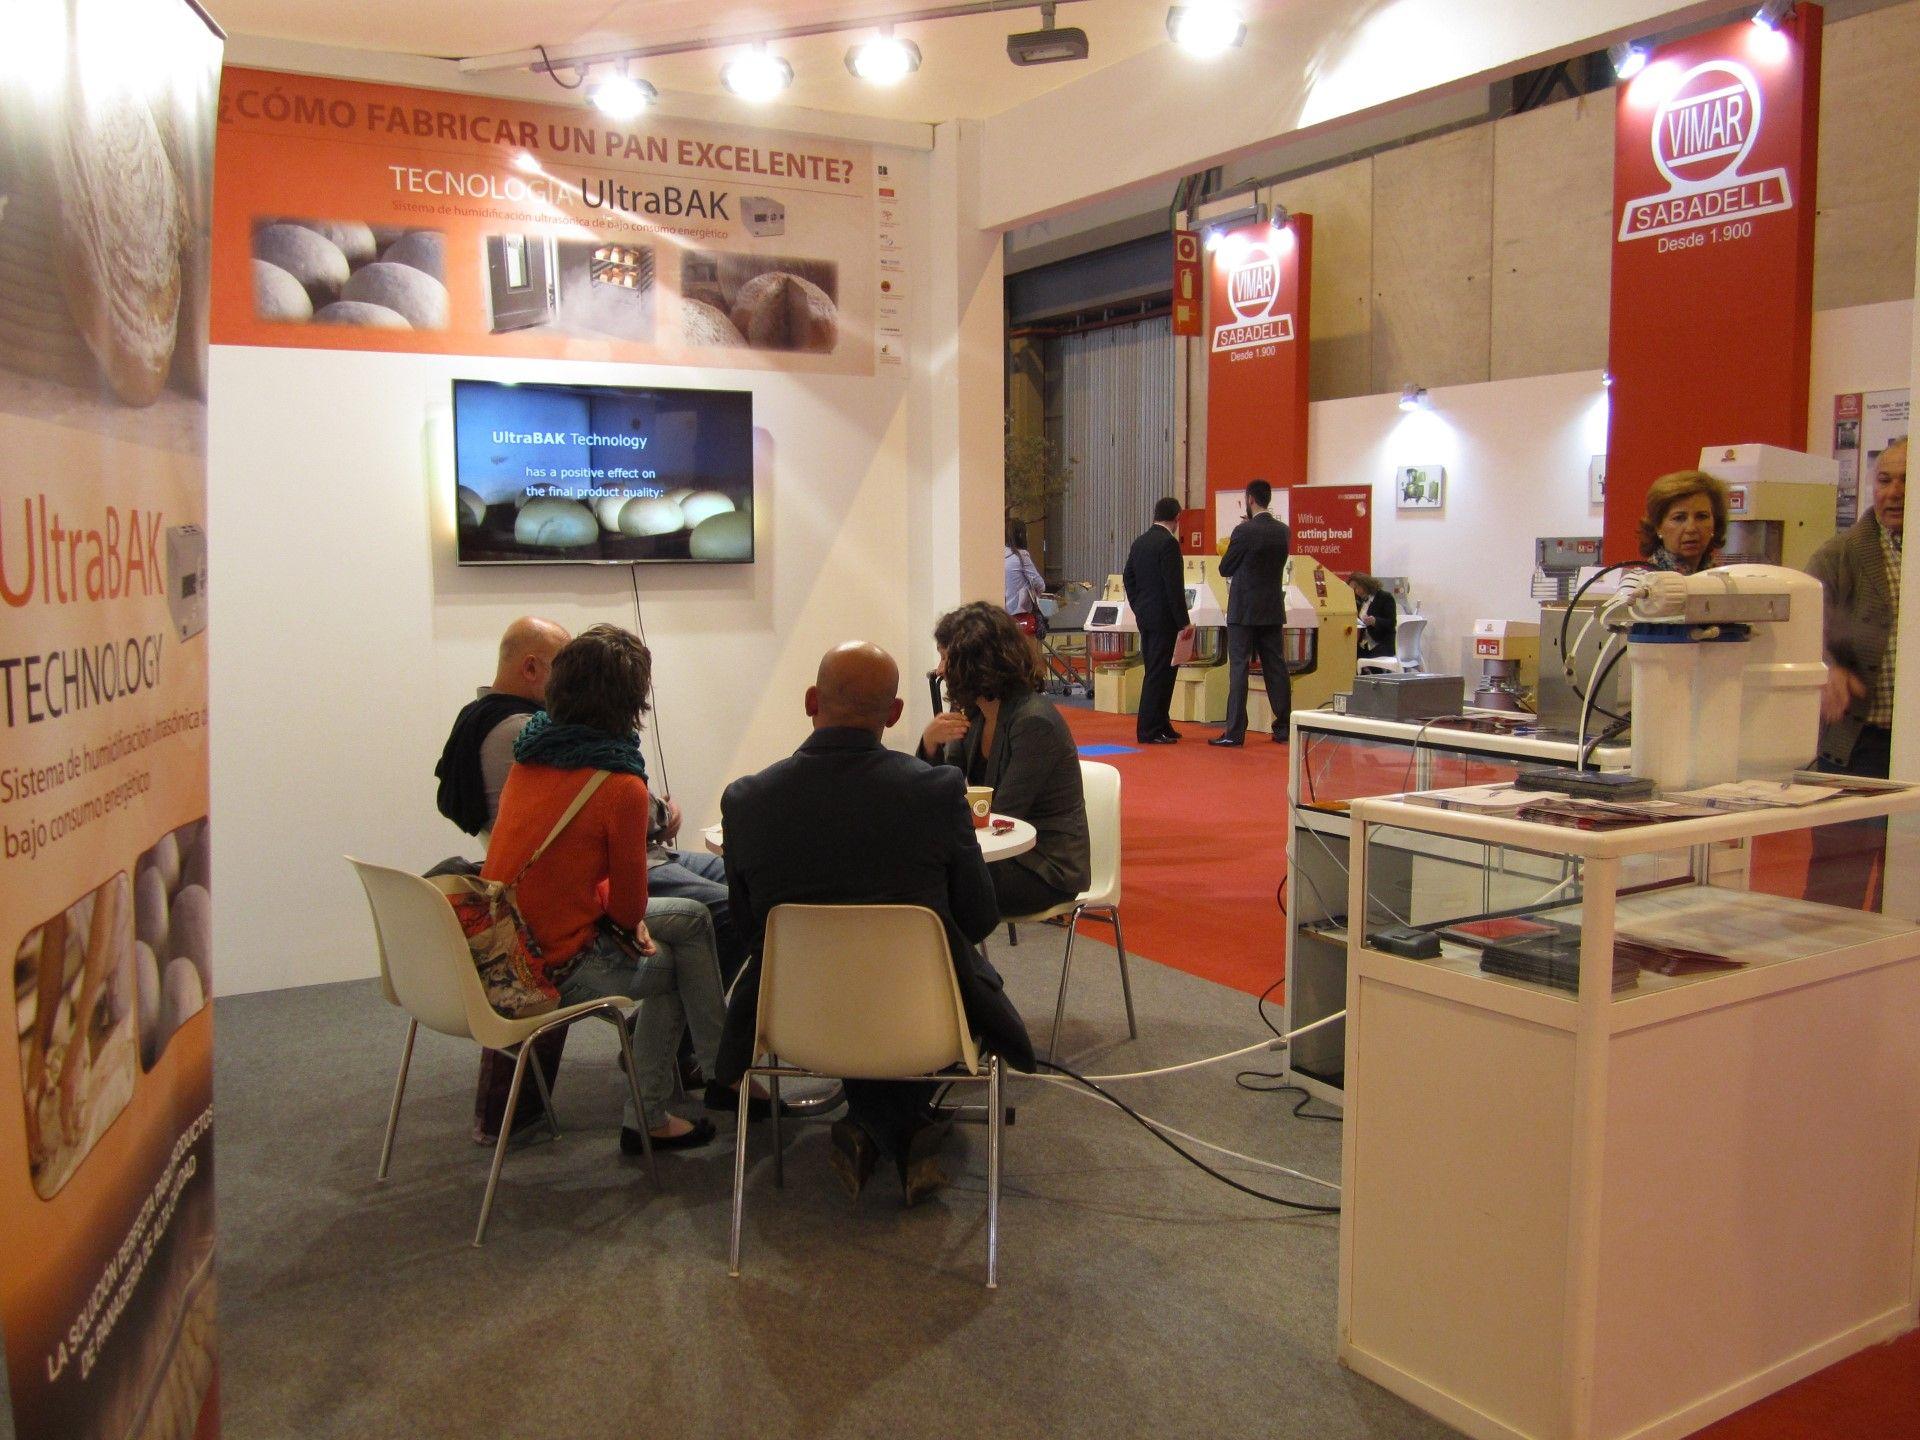 Bioazul en INTERSICOP 2015_Humidificadores ultrasónicos para panadería UltraBAK